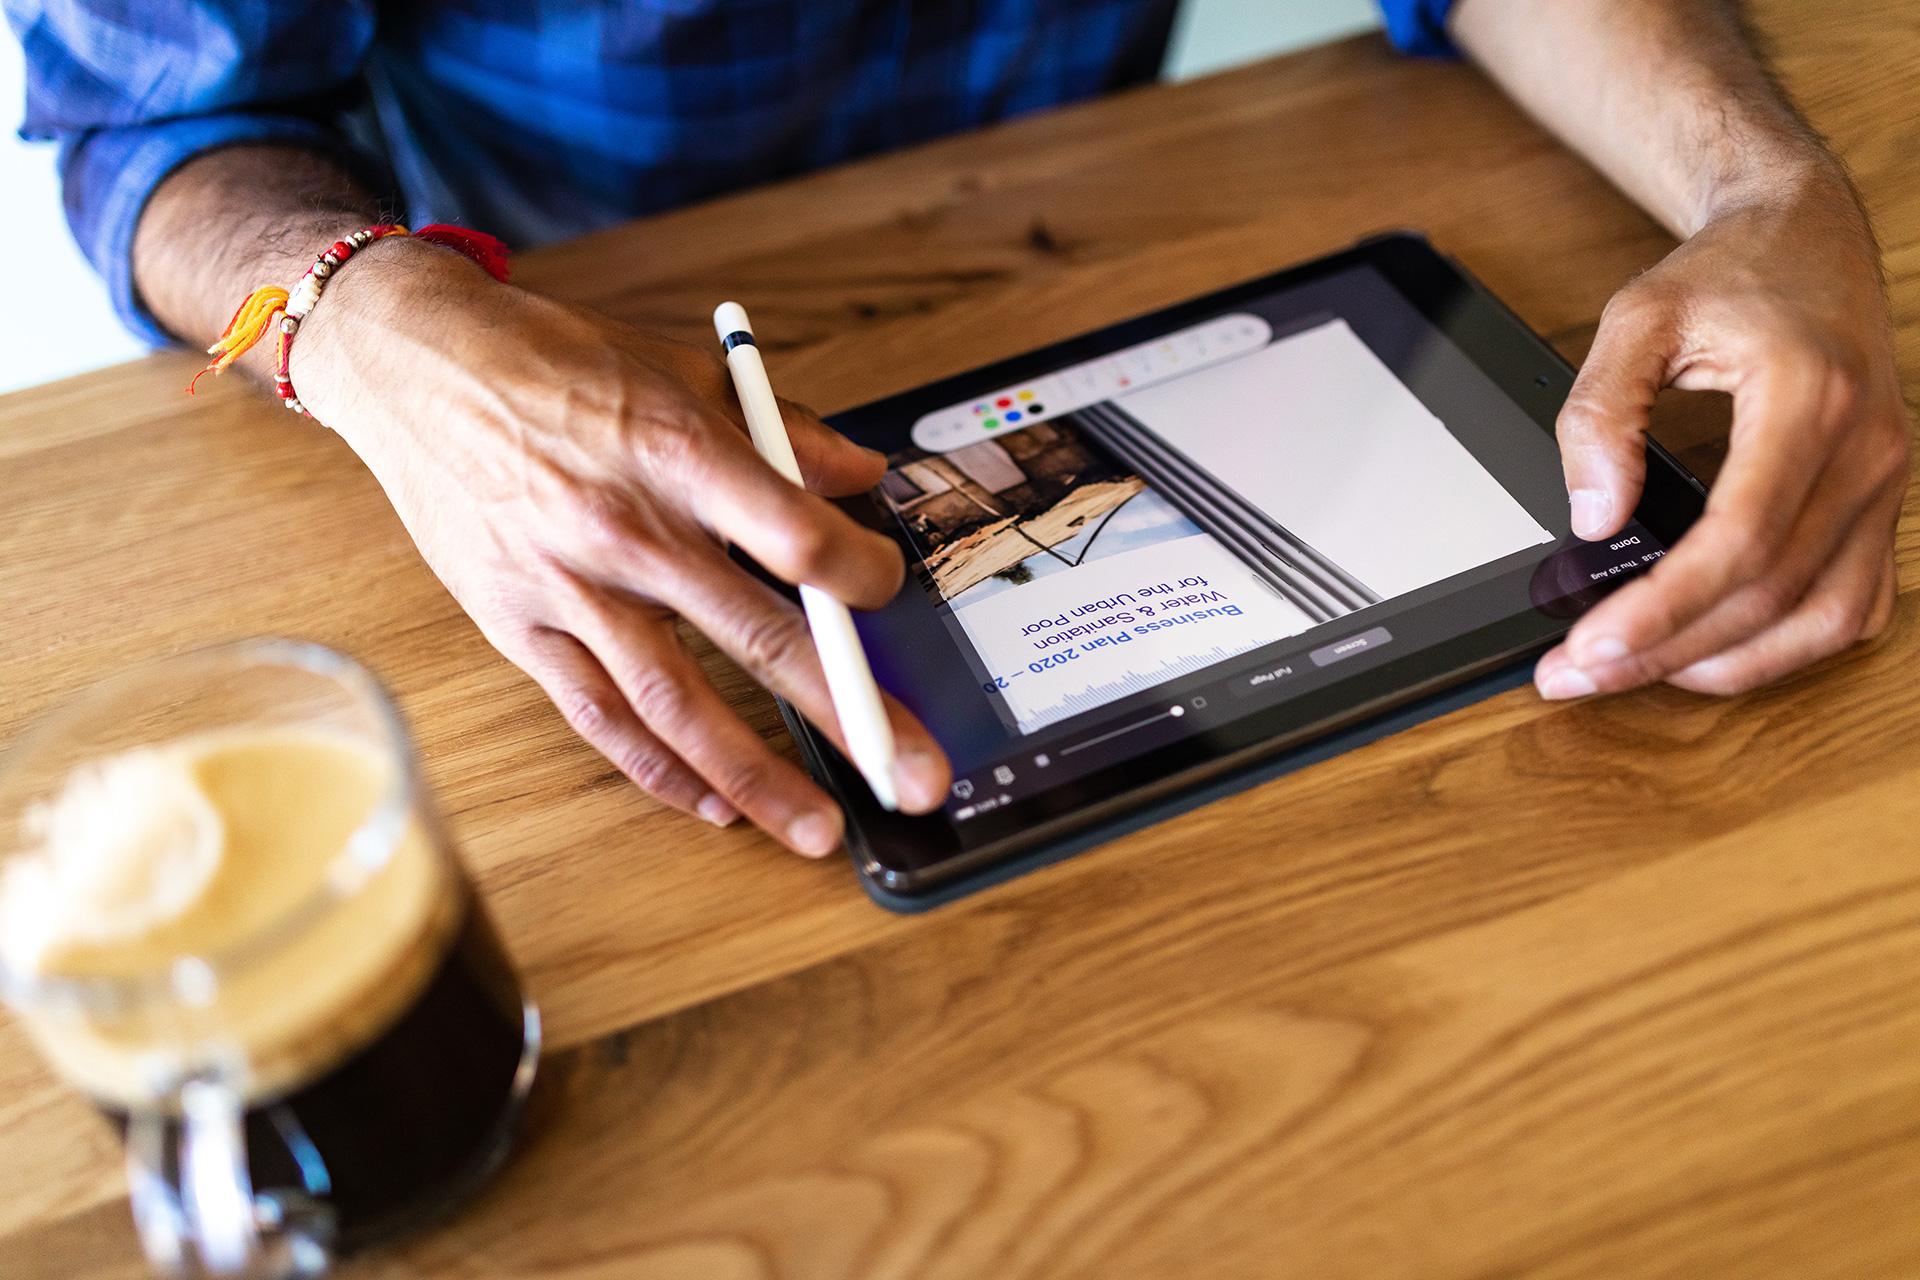 iPad, design work image